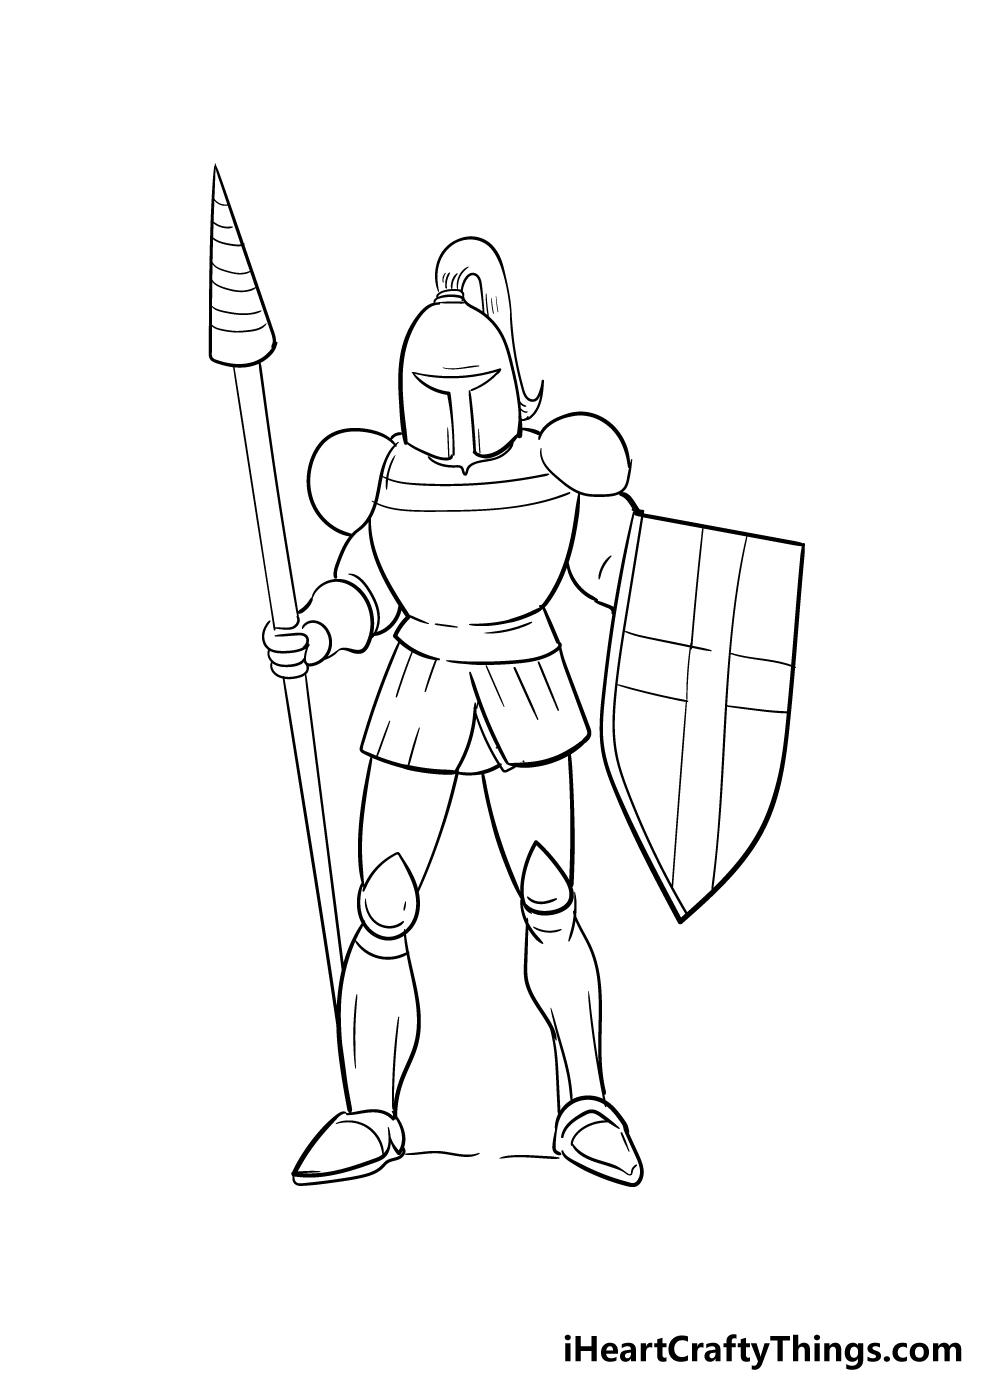 knight drawing step 7